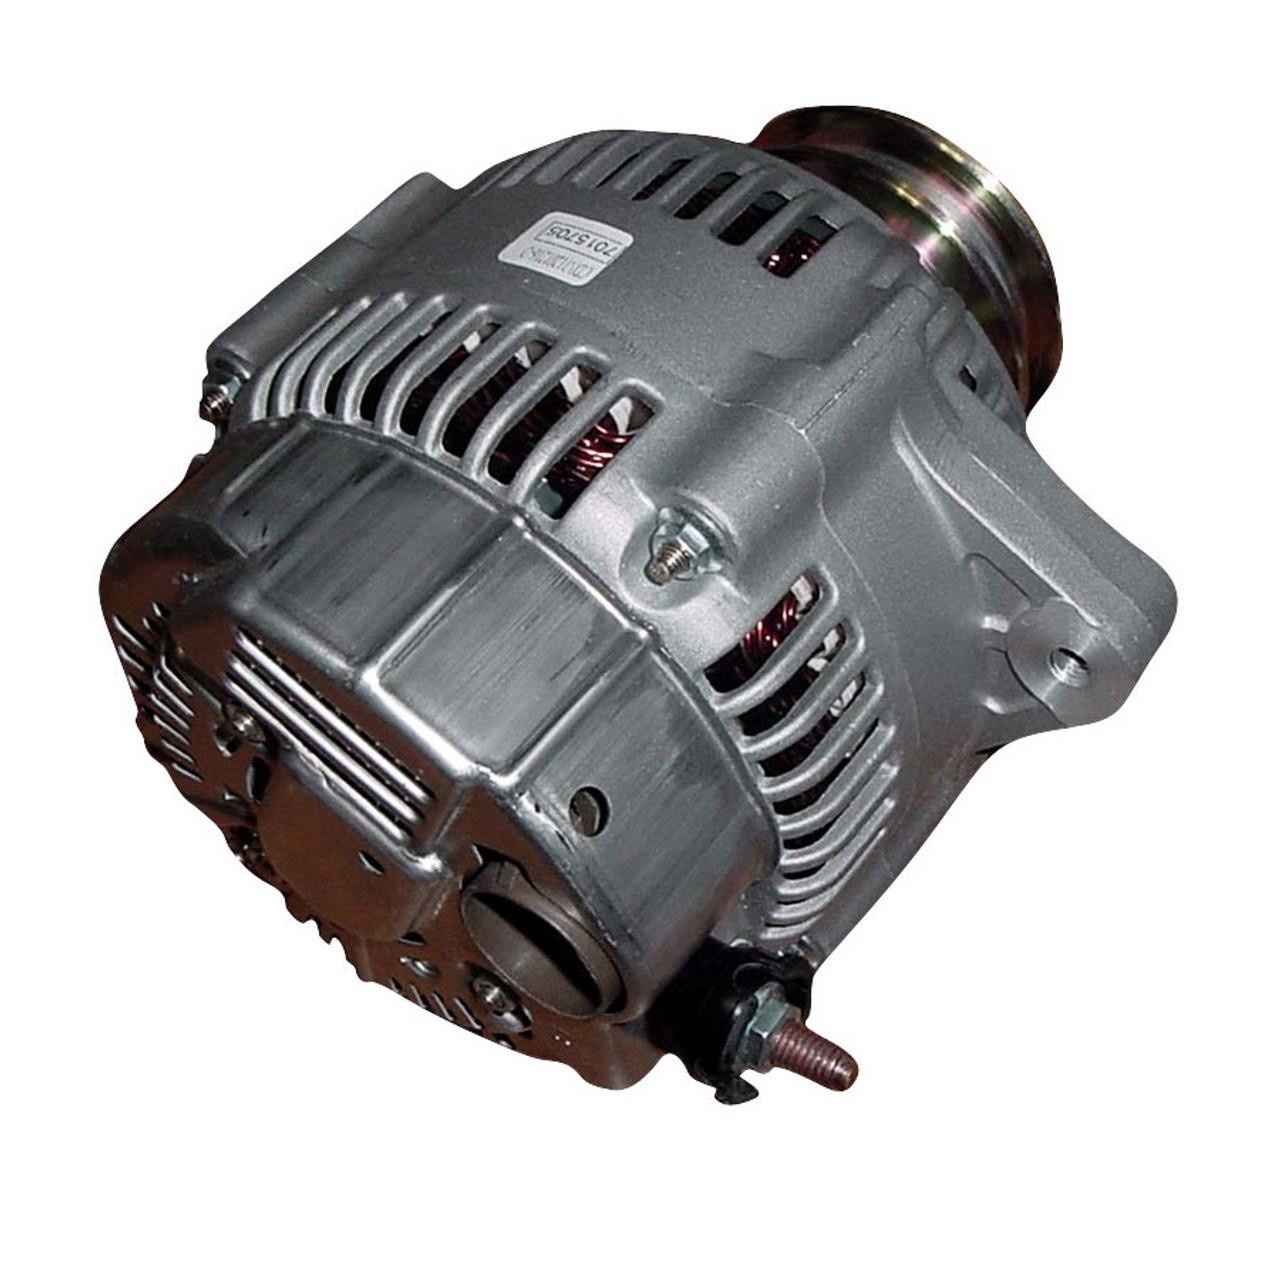 Aftermarket JD Alternator TY6684 1 Yr Warranty